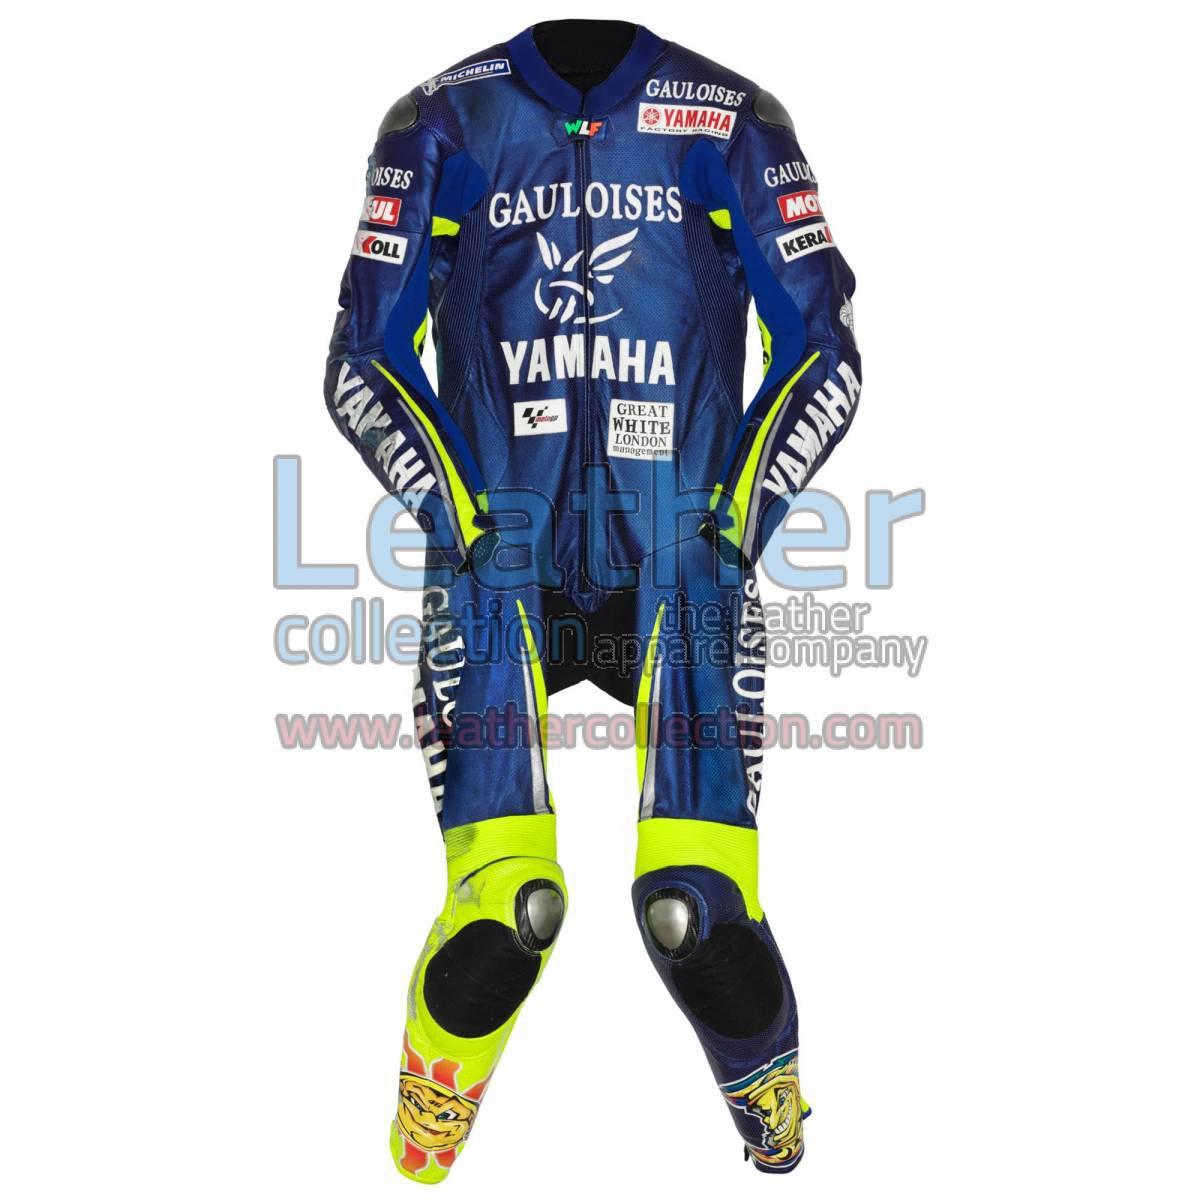 Valentino Rossi Yamaha MotoGP 2005 Race Suit